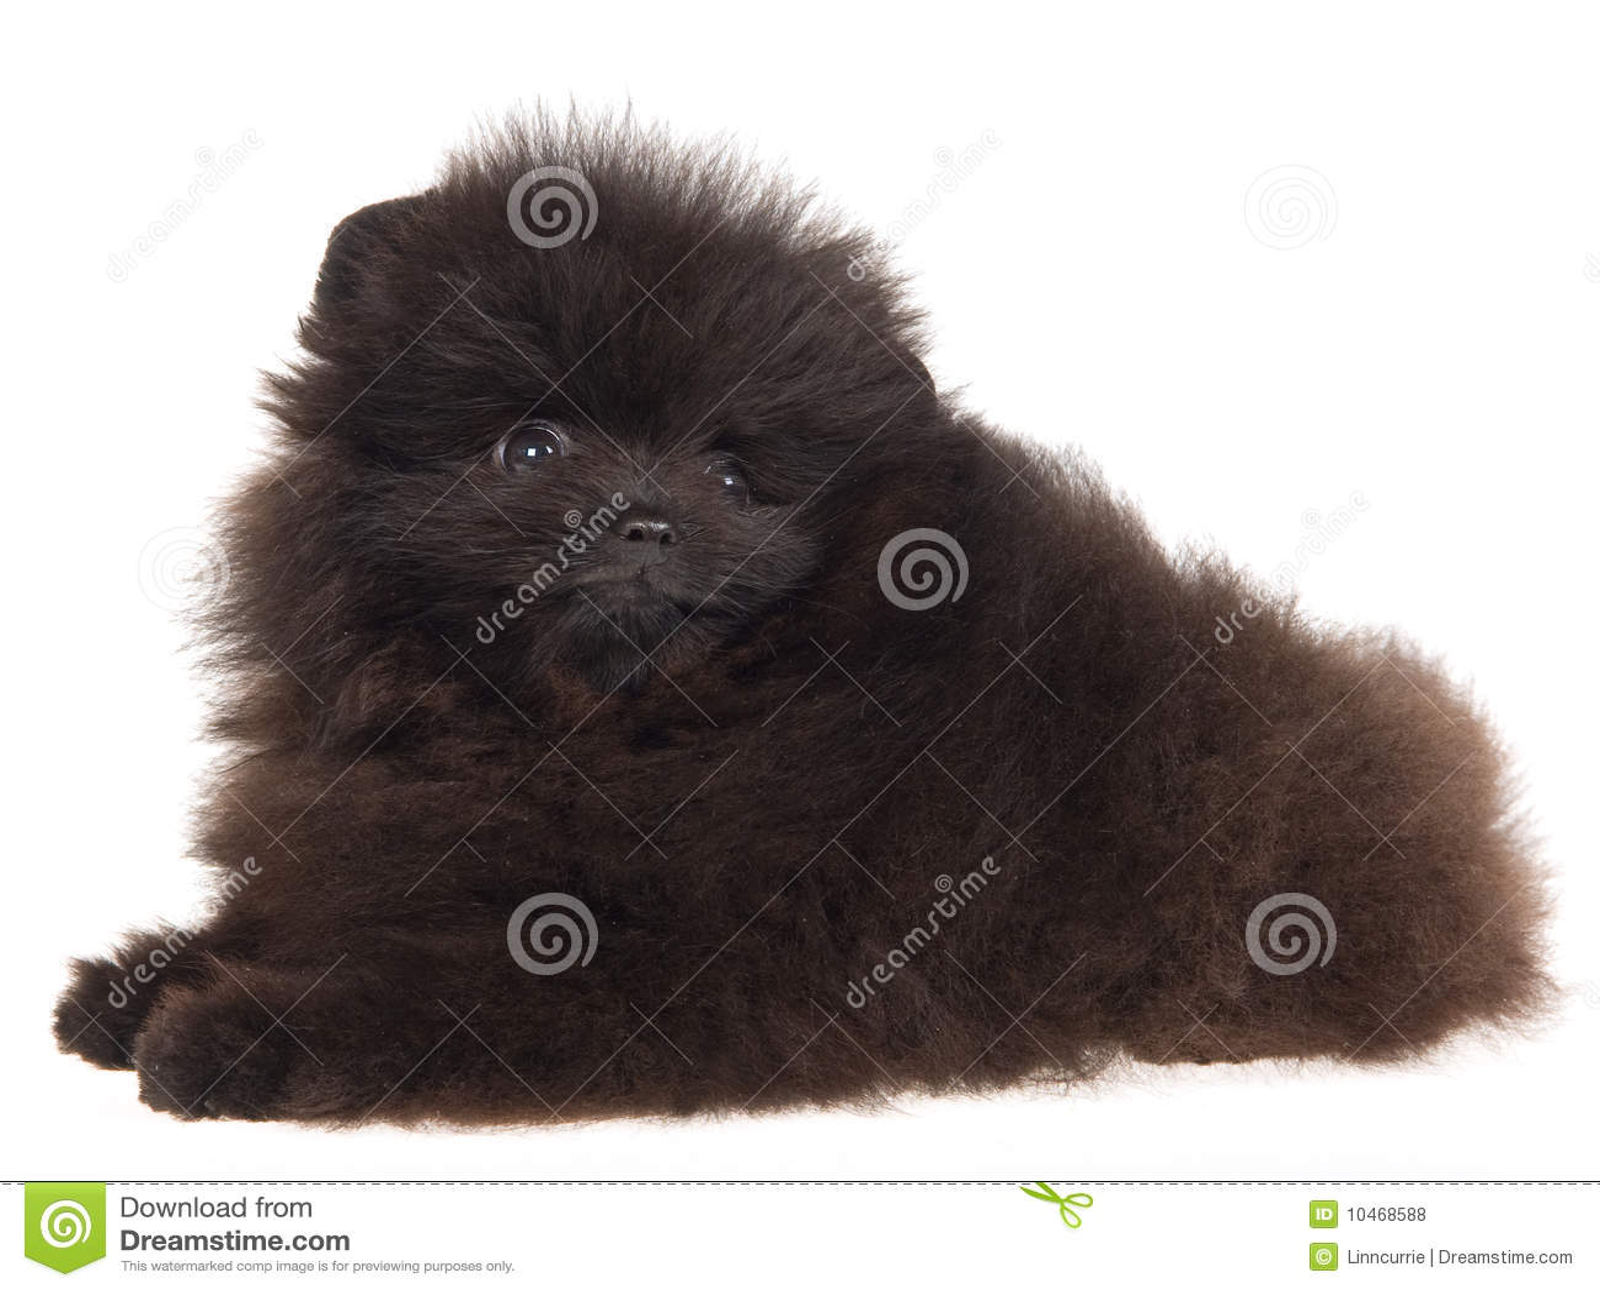 Royalty Free Stock Photos: Black Pomeranian puppy on white background